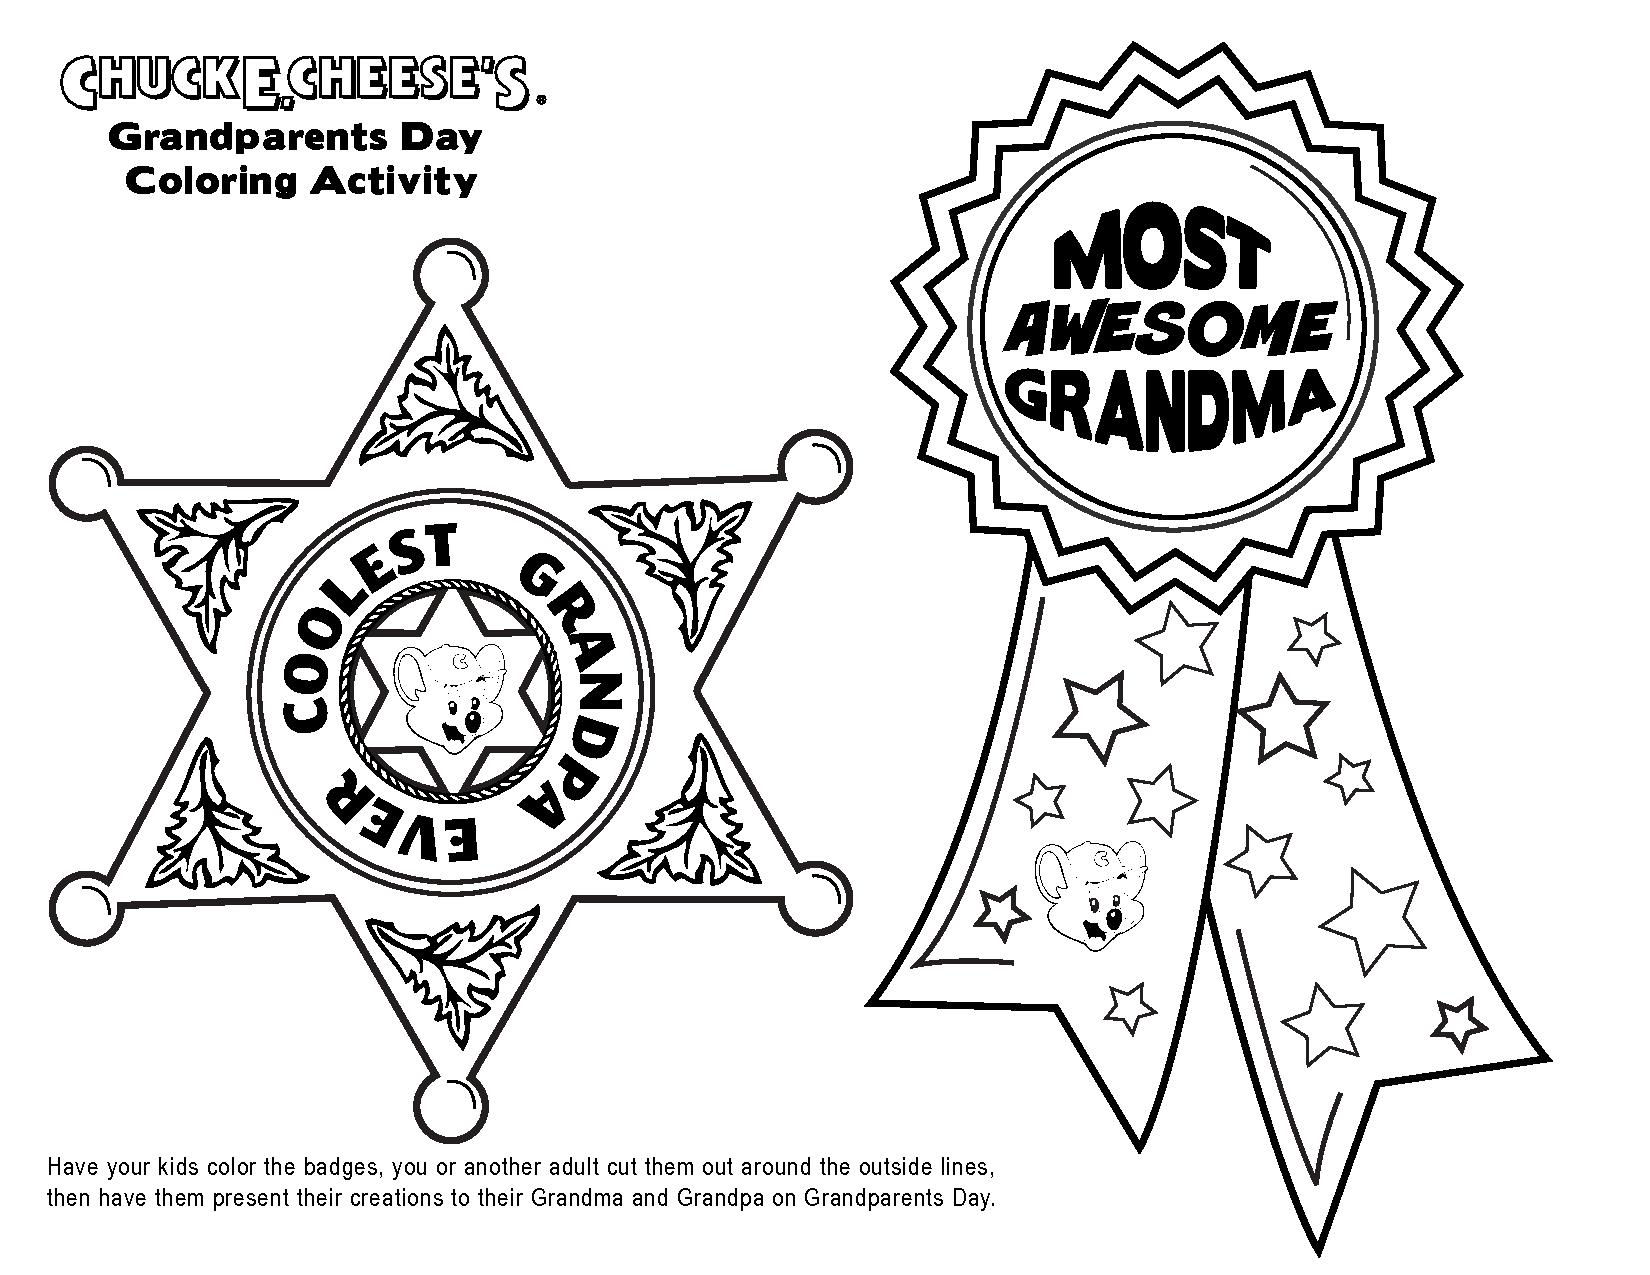 Grandparents Coloring Pages